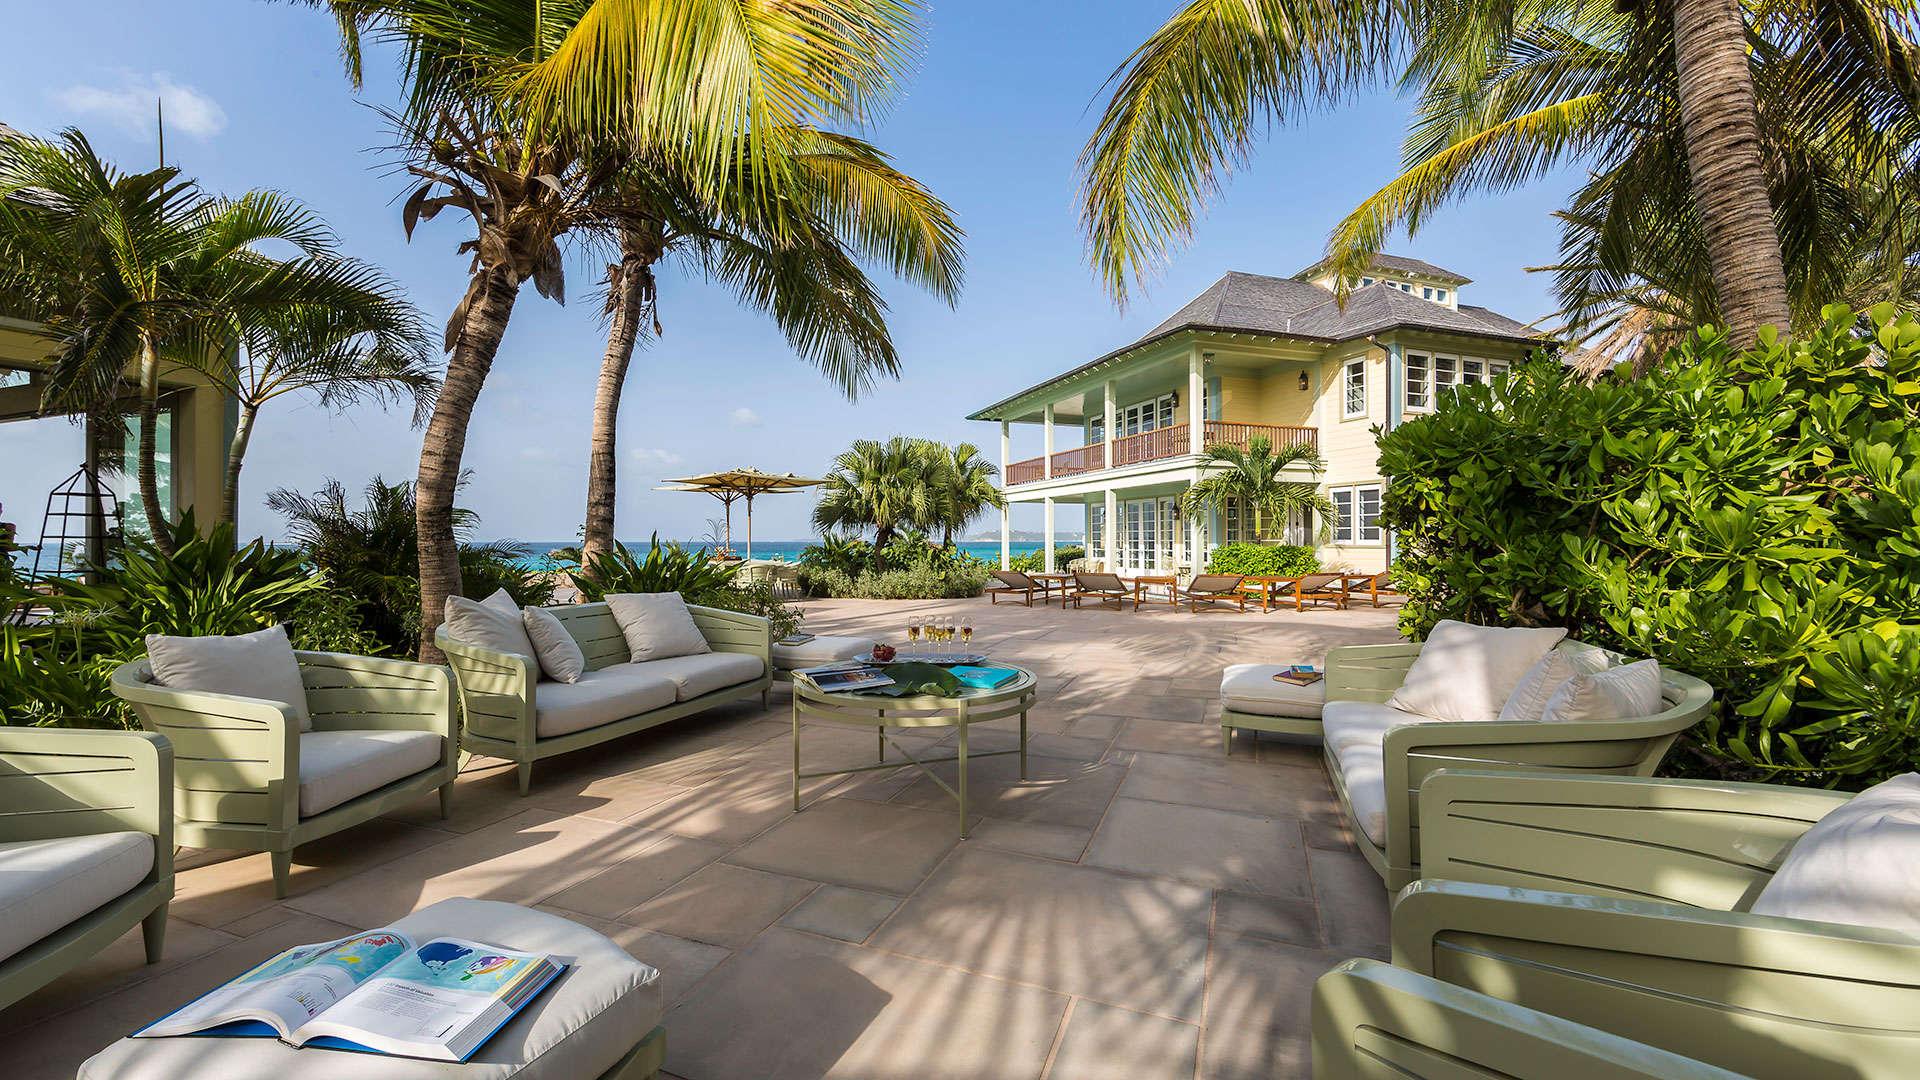 Luxury villa rentals caribbean - Anguilla - Longbay - Santosha - Image 1/27